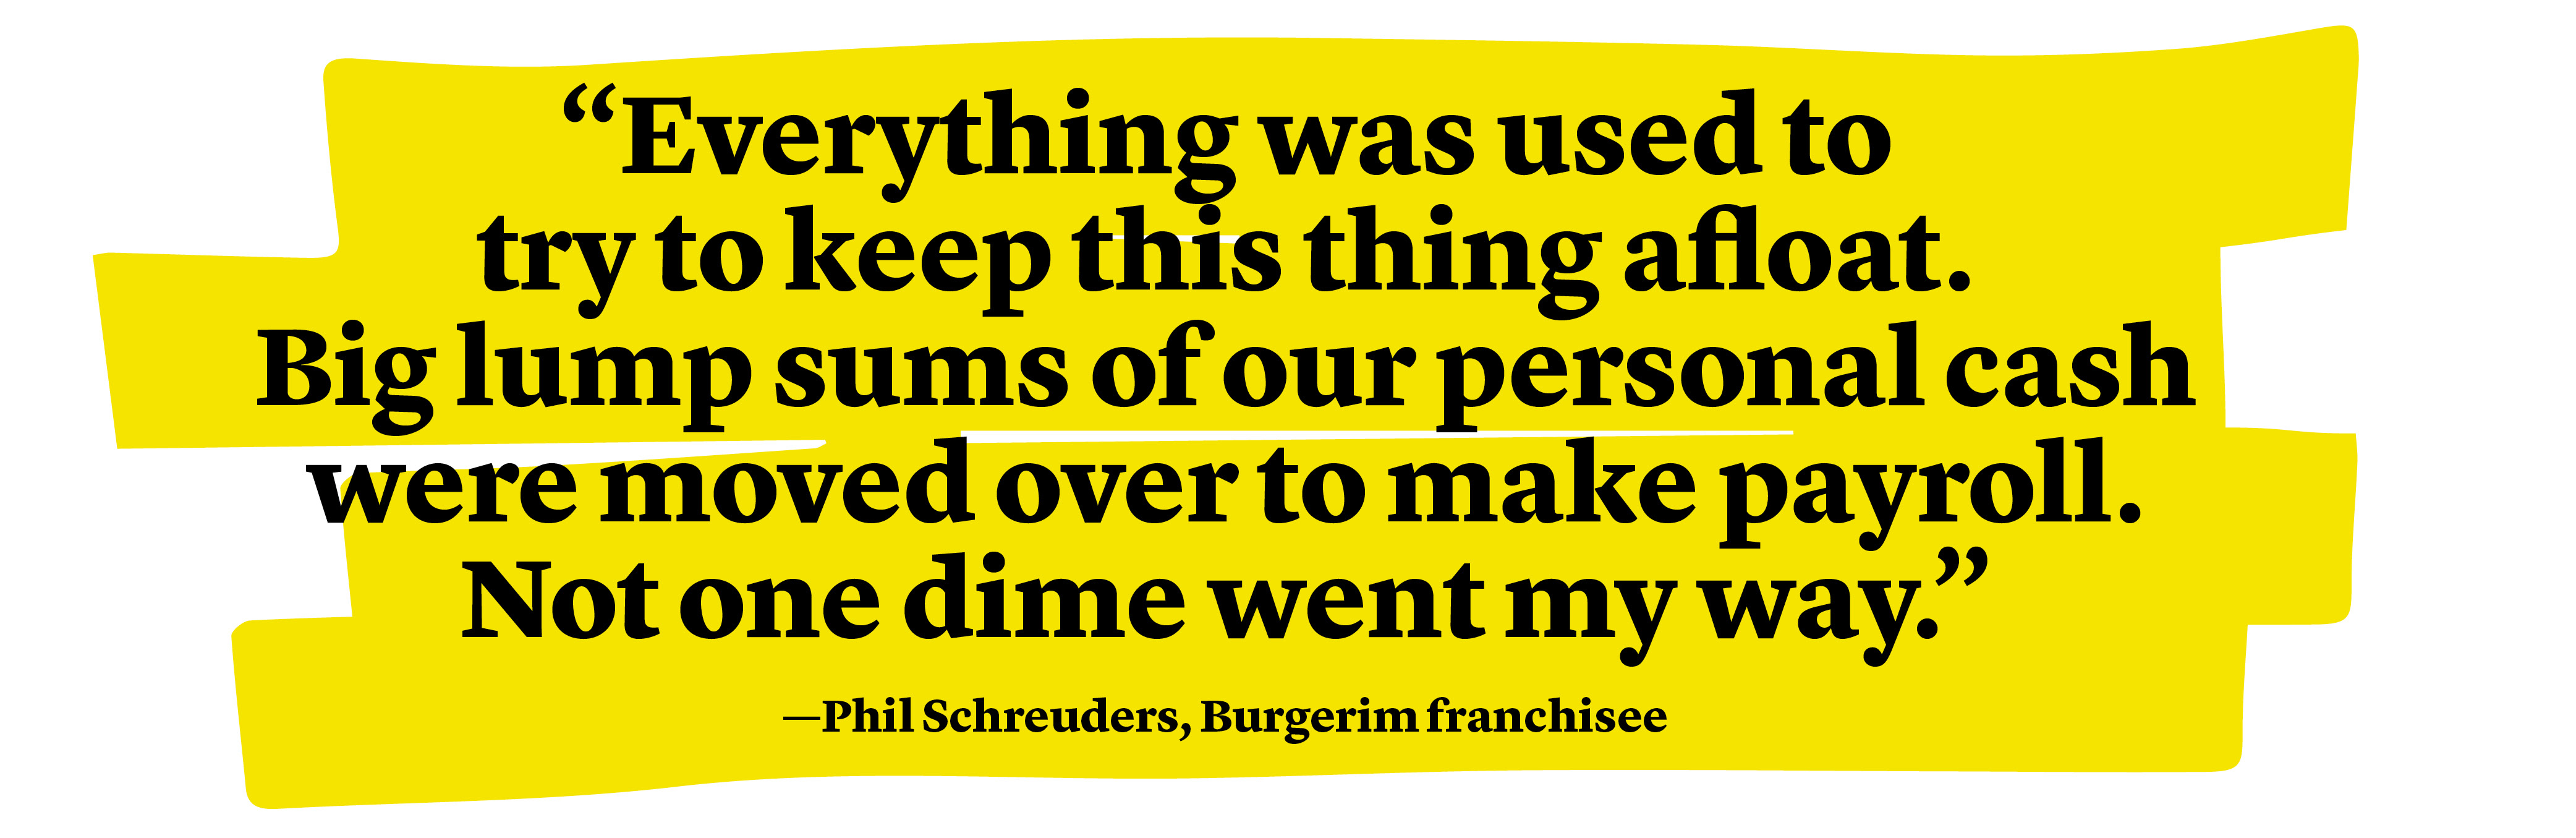 Phil Schreuders quote